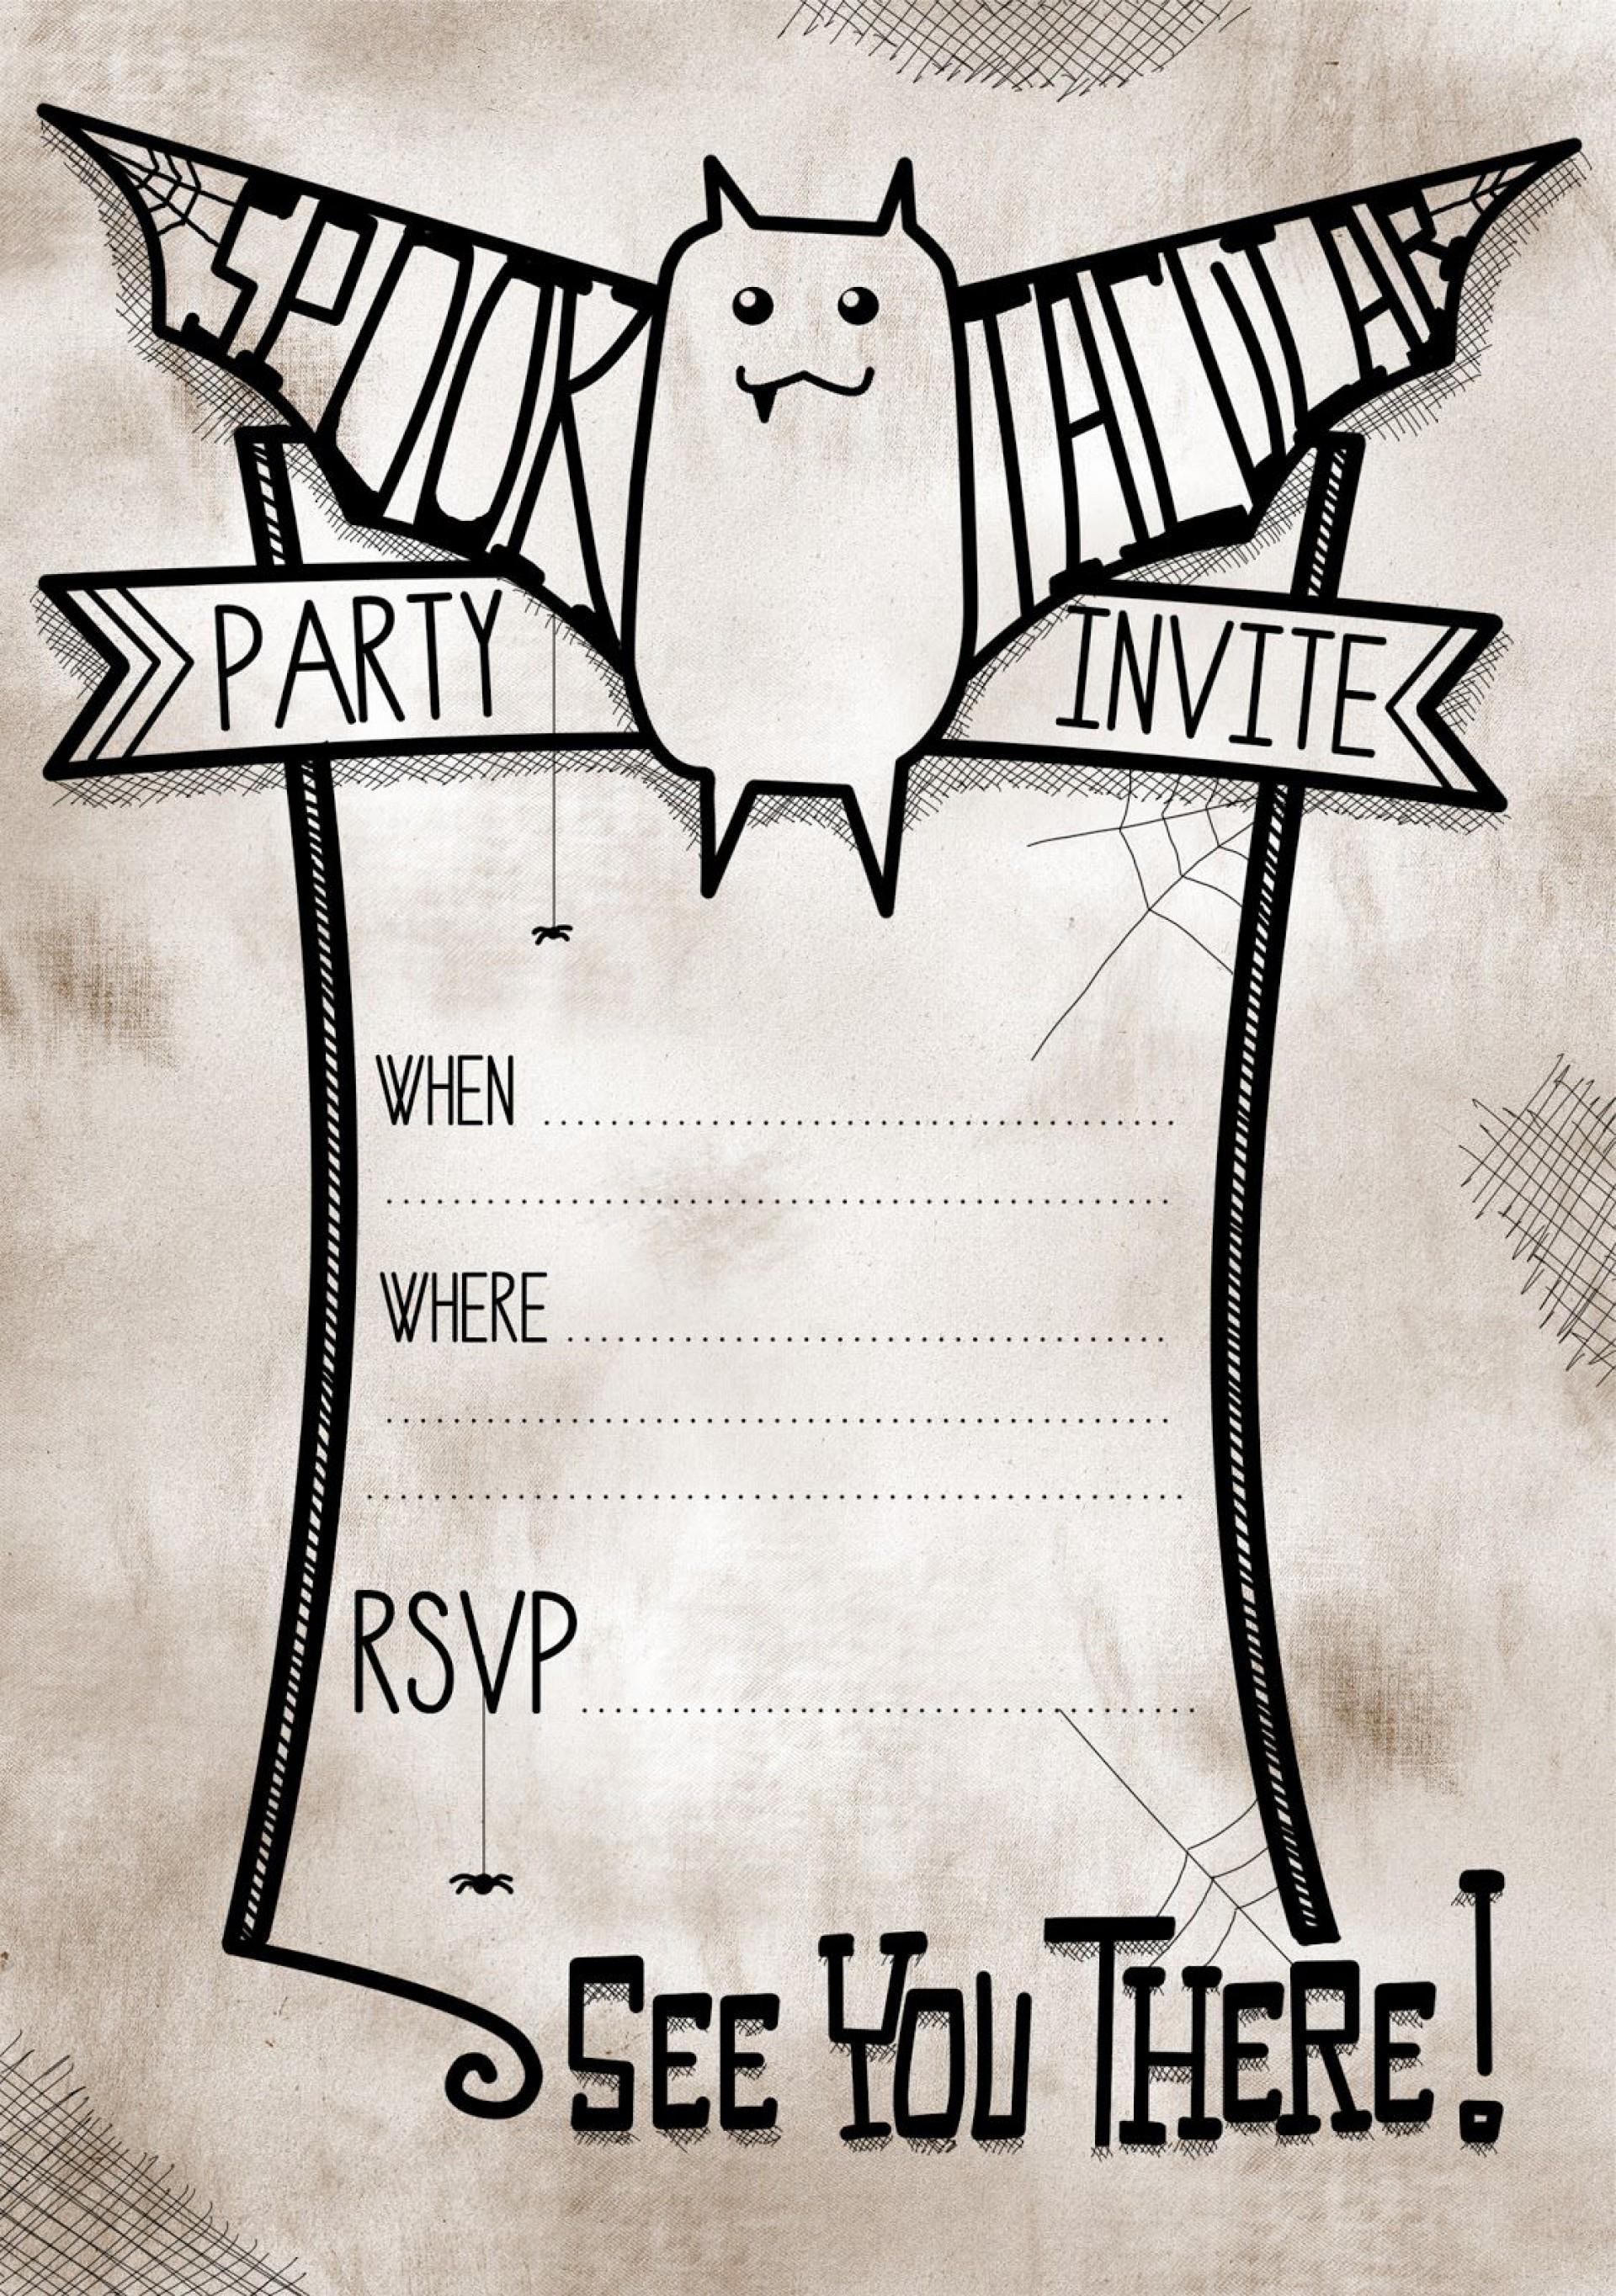 009 Breathtaking Free Halloween Invitation Template Sample  Templates Microsoft Word Wedding Printable Party1920